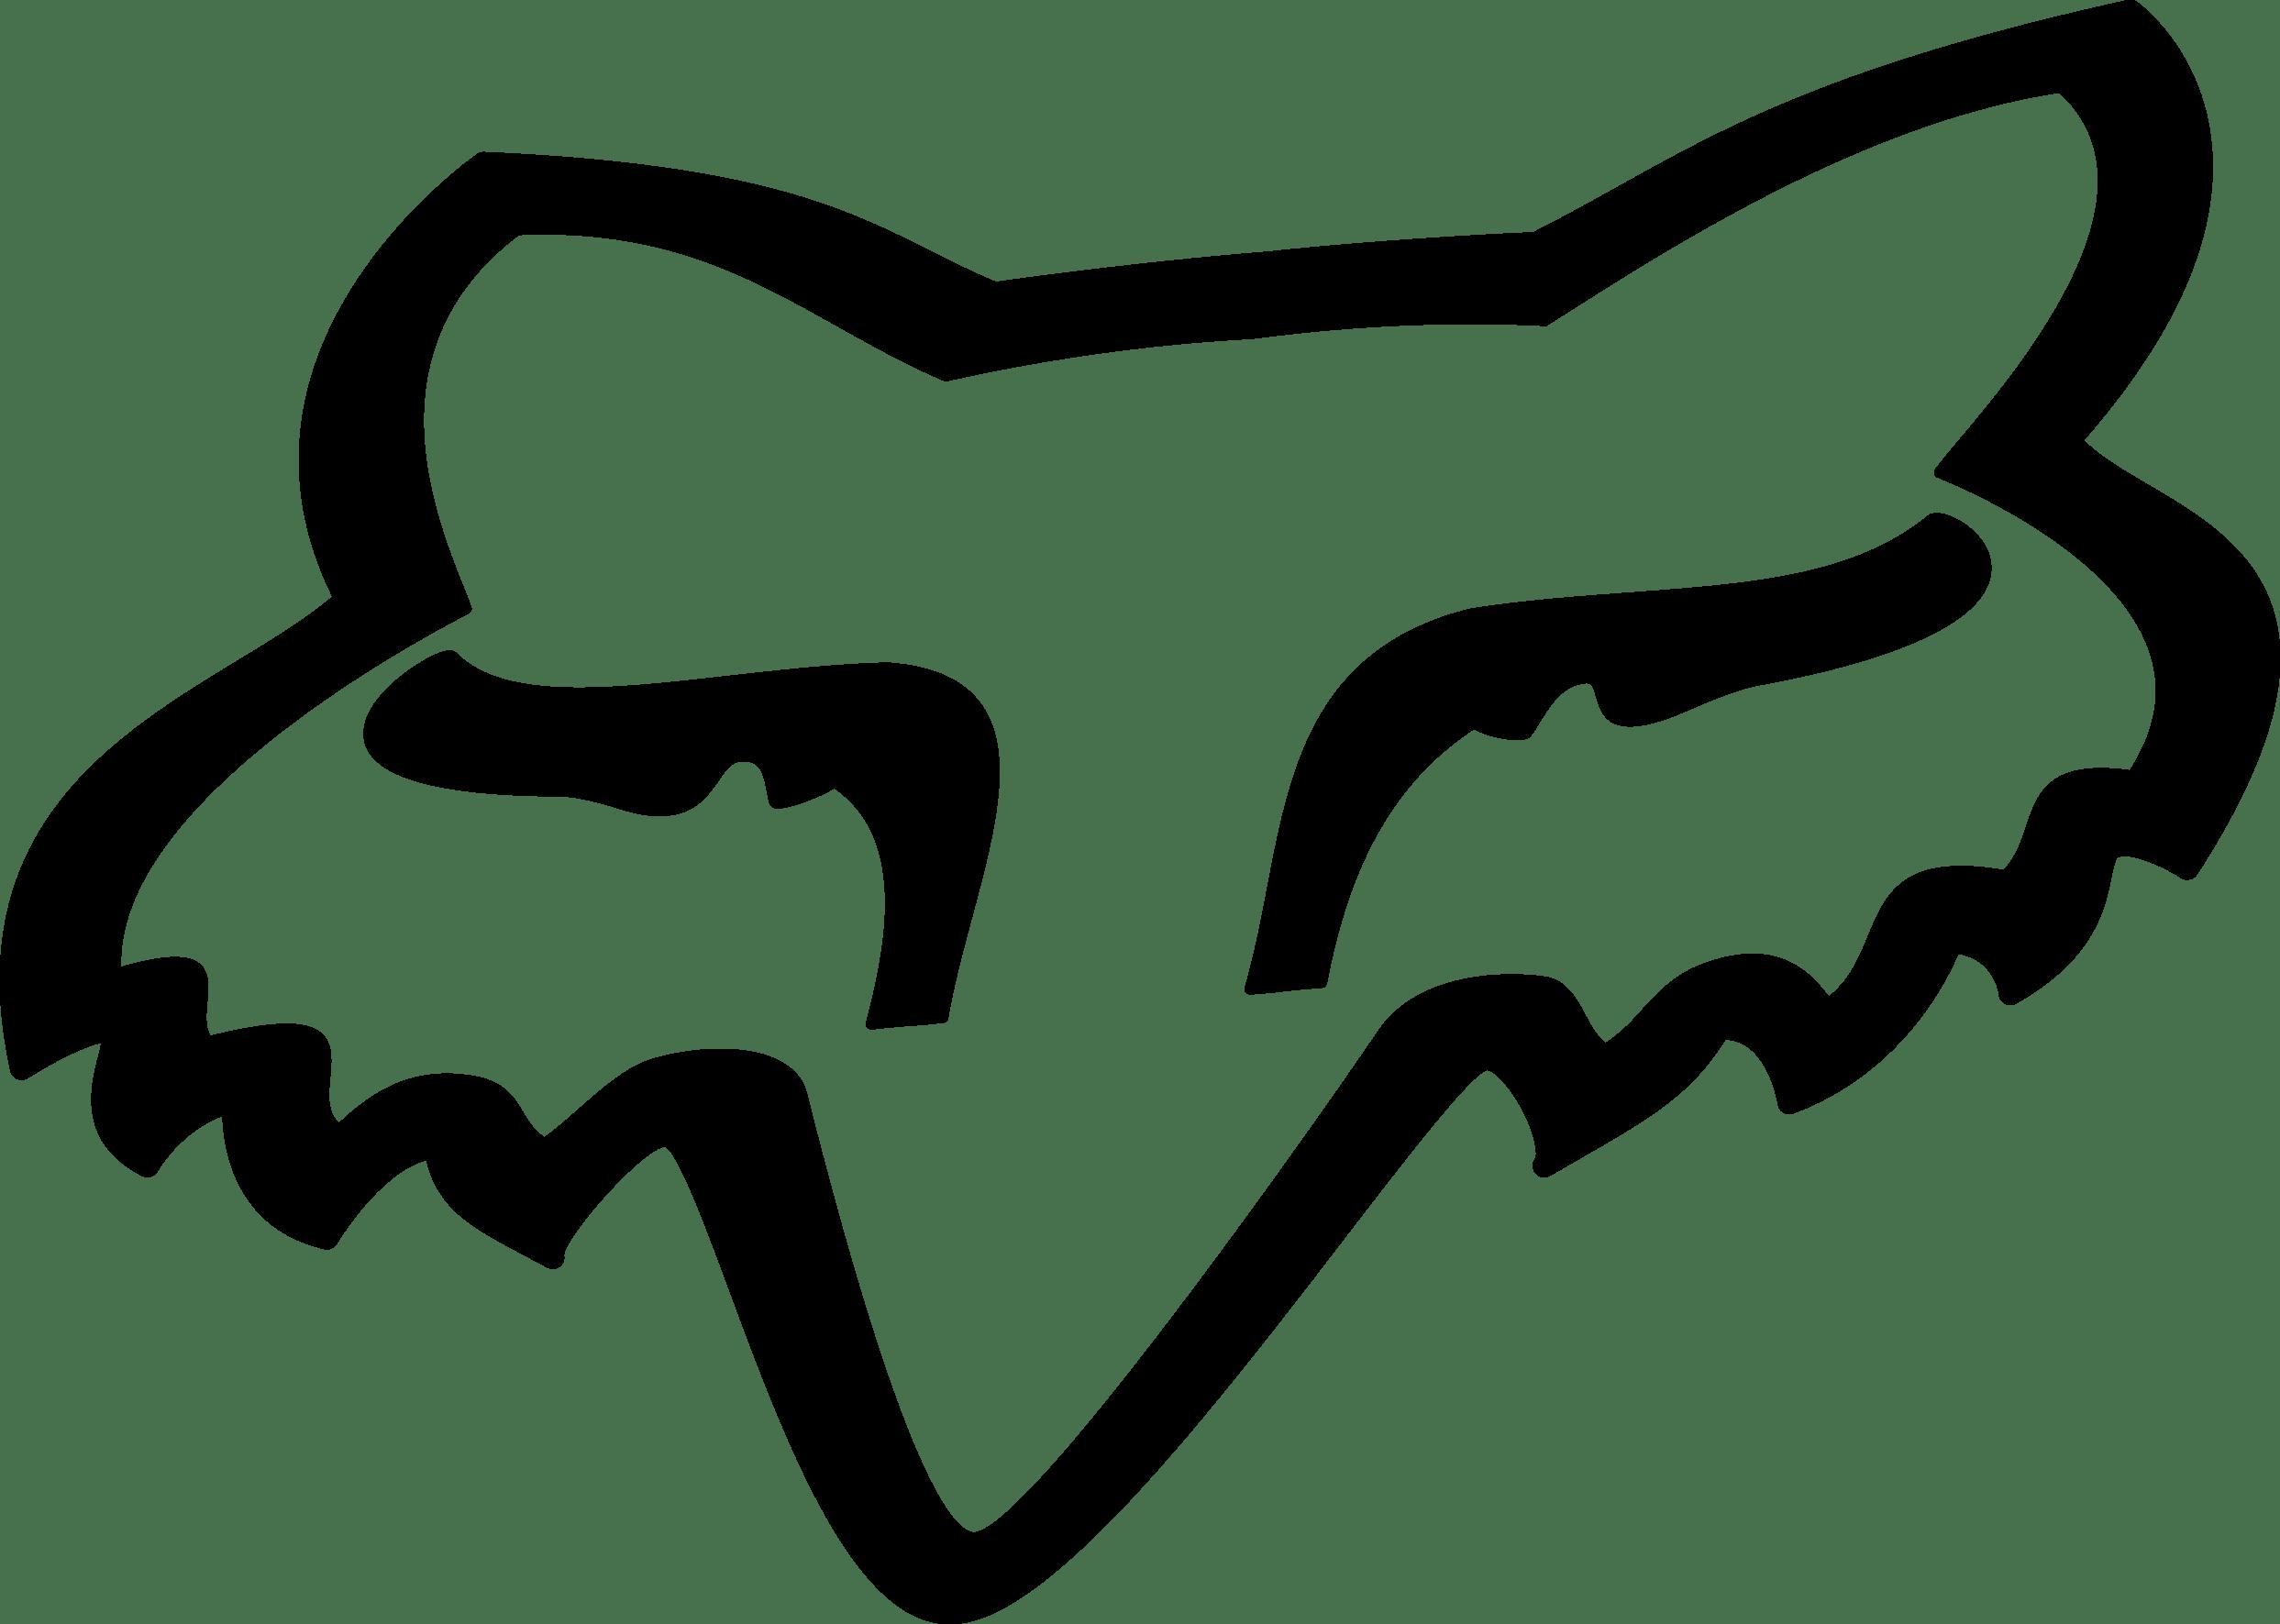 Fox racing logo vector eps free download logo icons clipart save buycottarizona Gallery